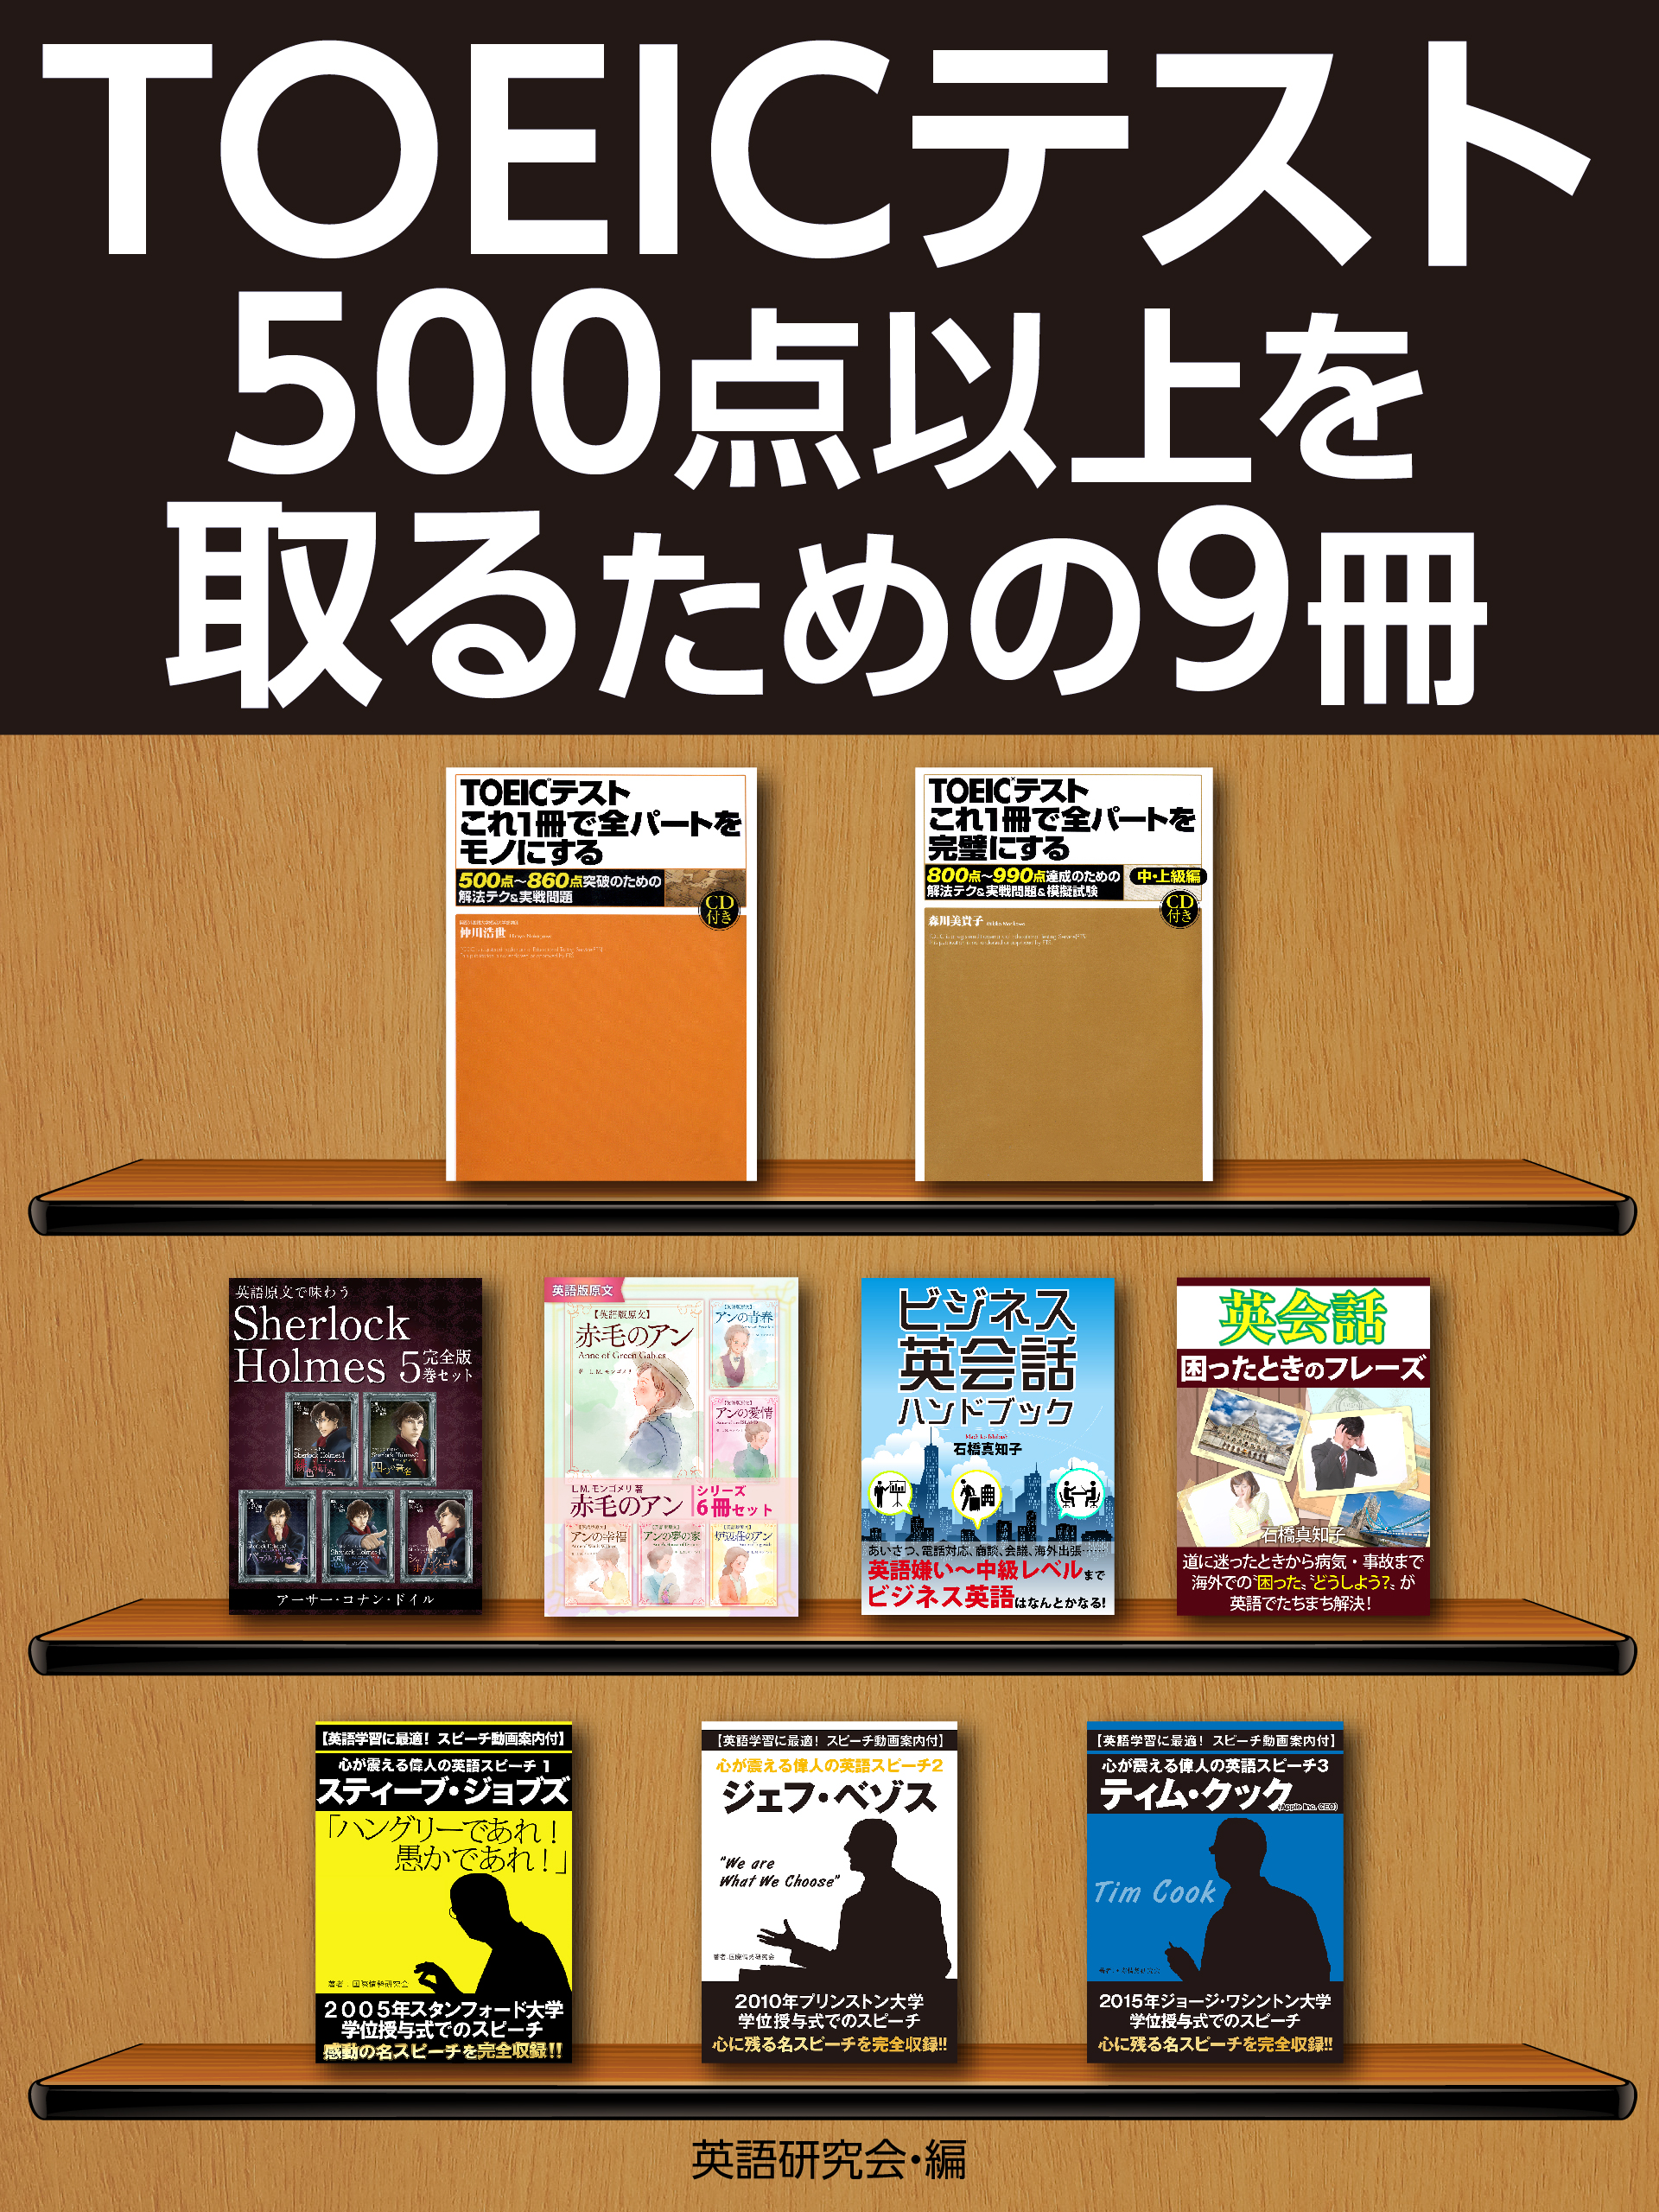 TOEICテスト500点以上を取るための9冊